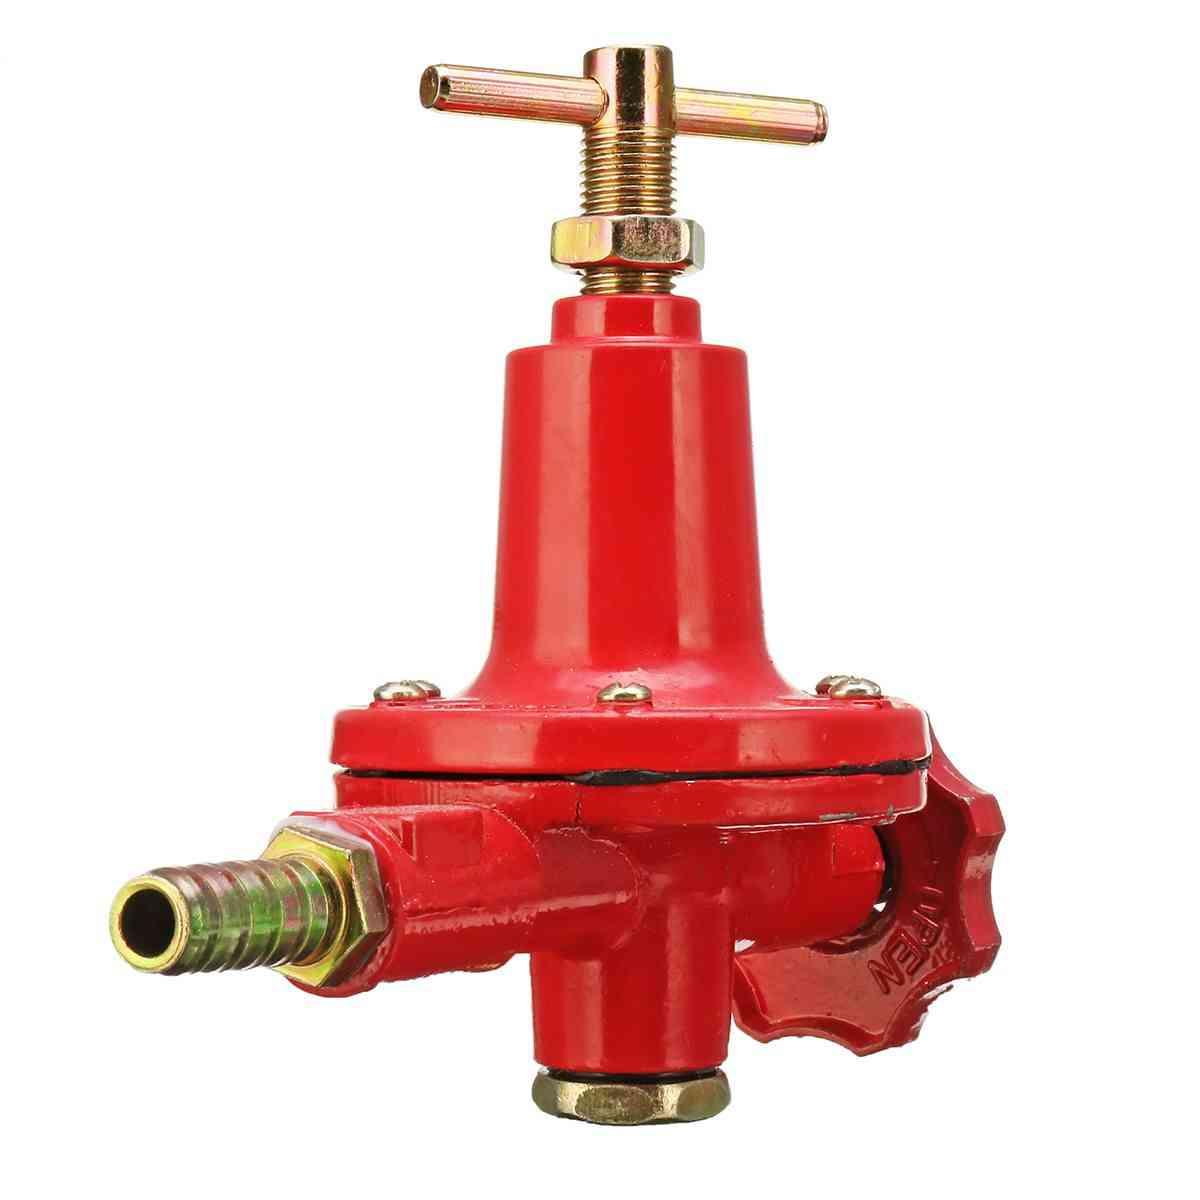 High Pressure Propane Regulator